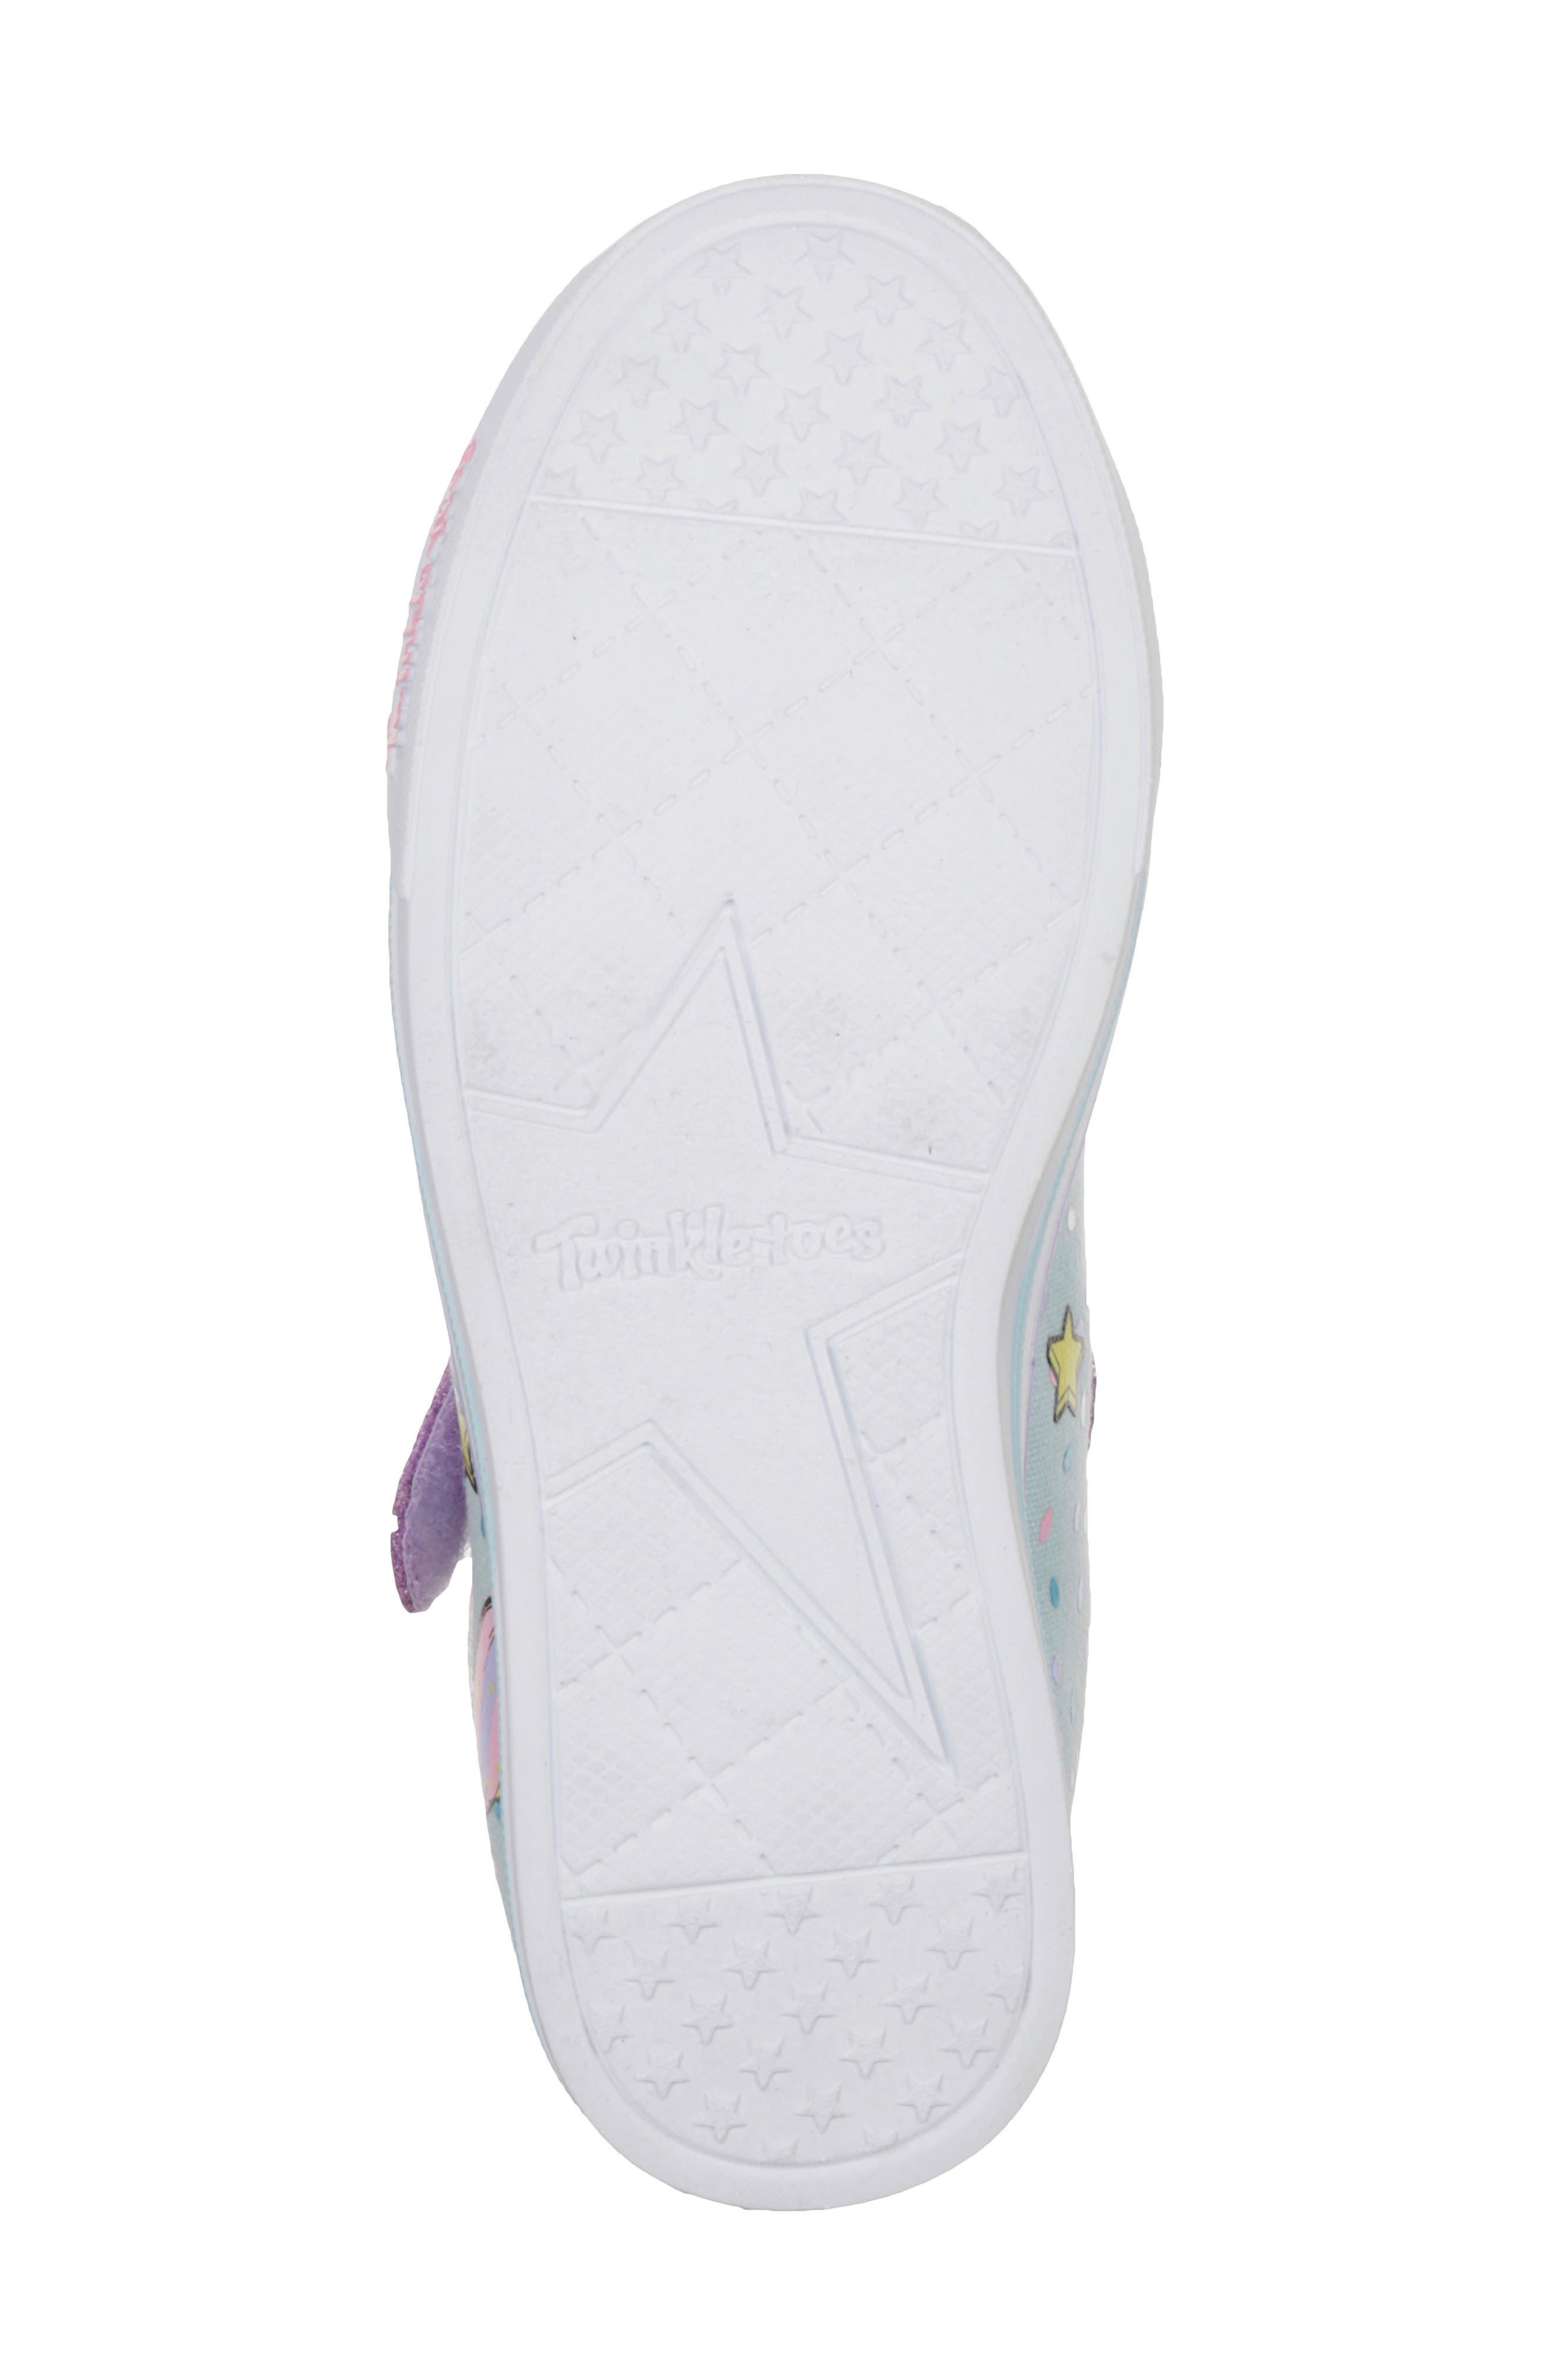 Twinkle Toes Unicorn Light-Up Sneaker,                             Main thumbnail 1, color,                             LIGHT BLUE/ MULTI